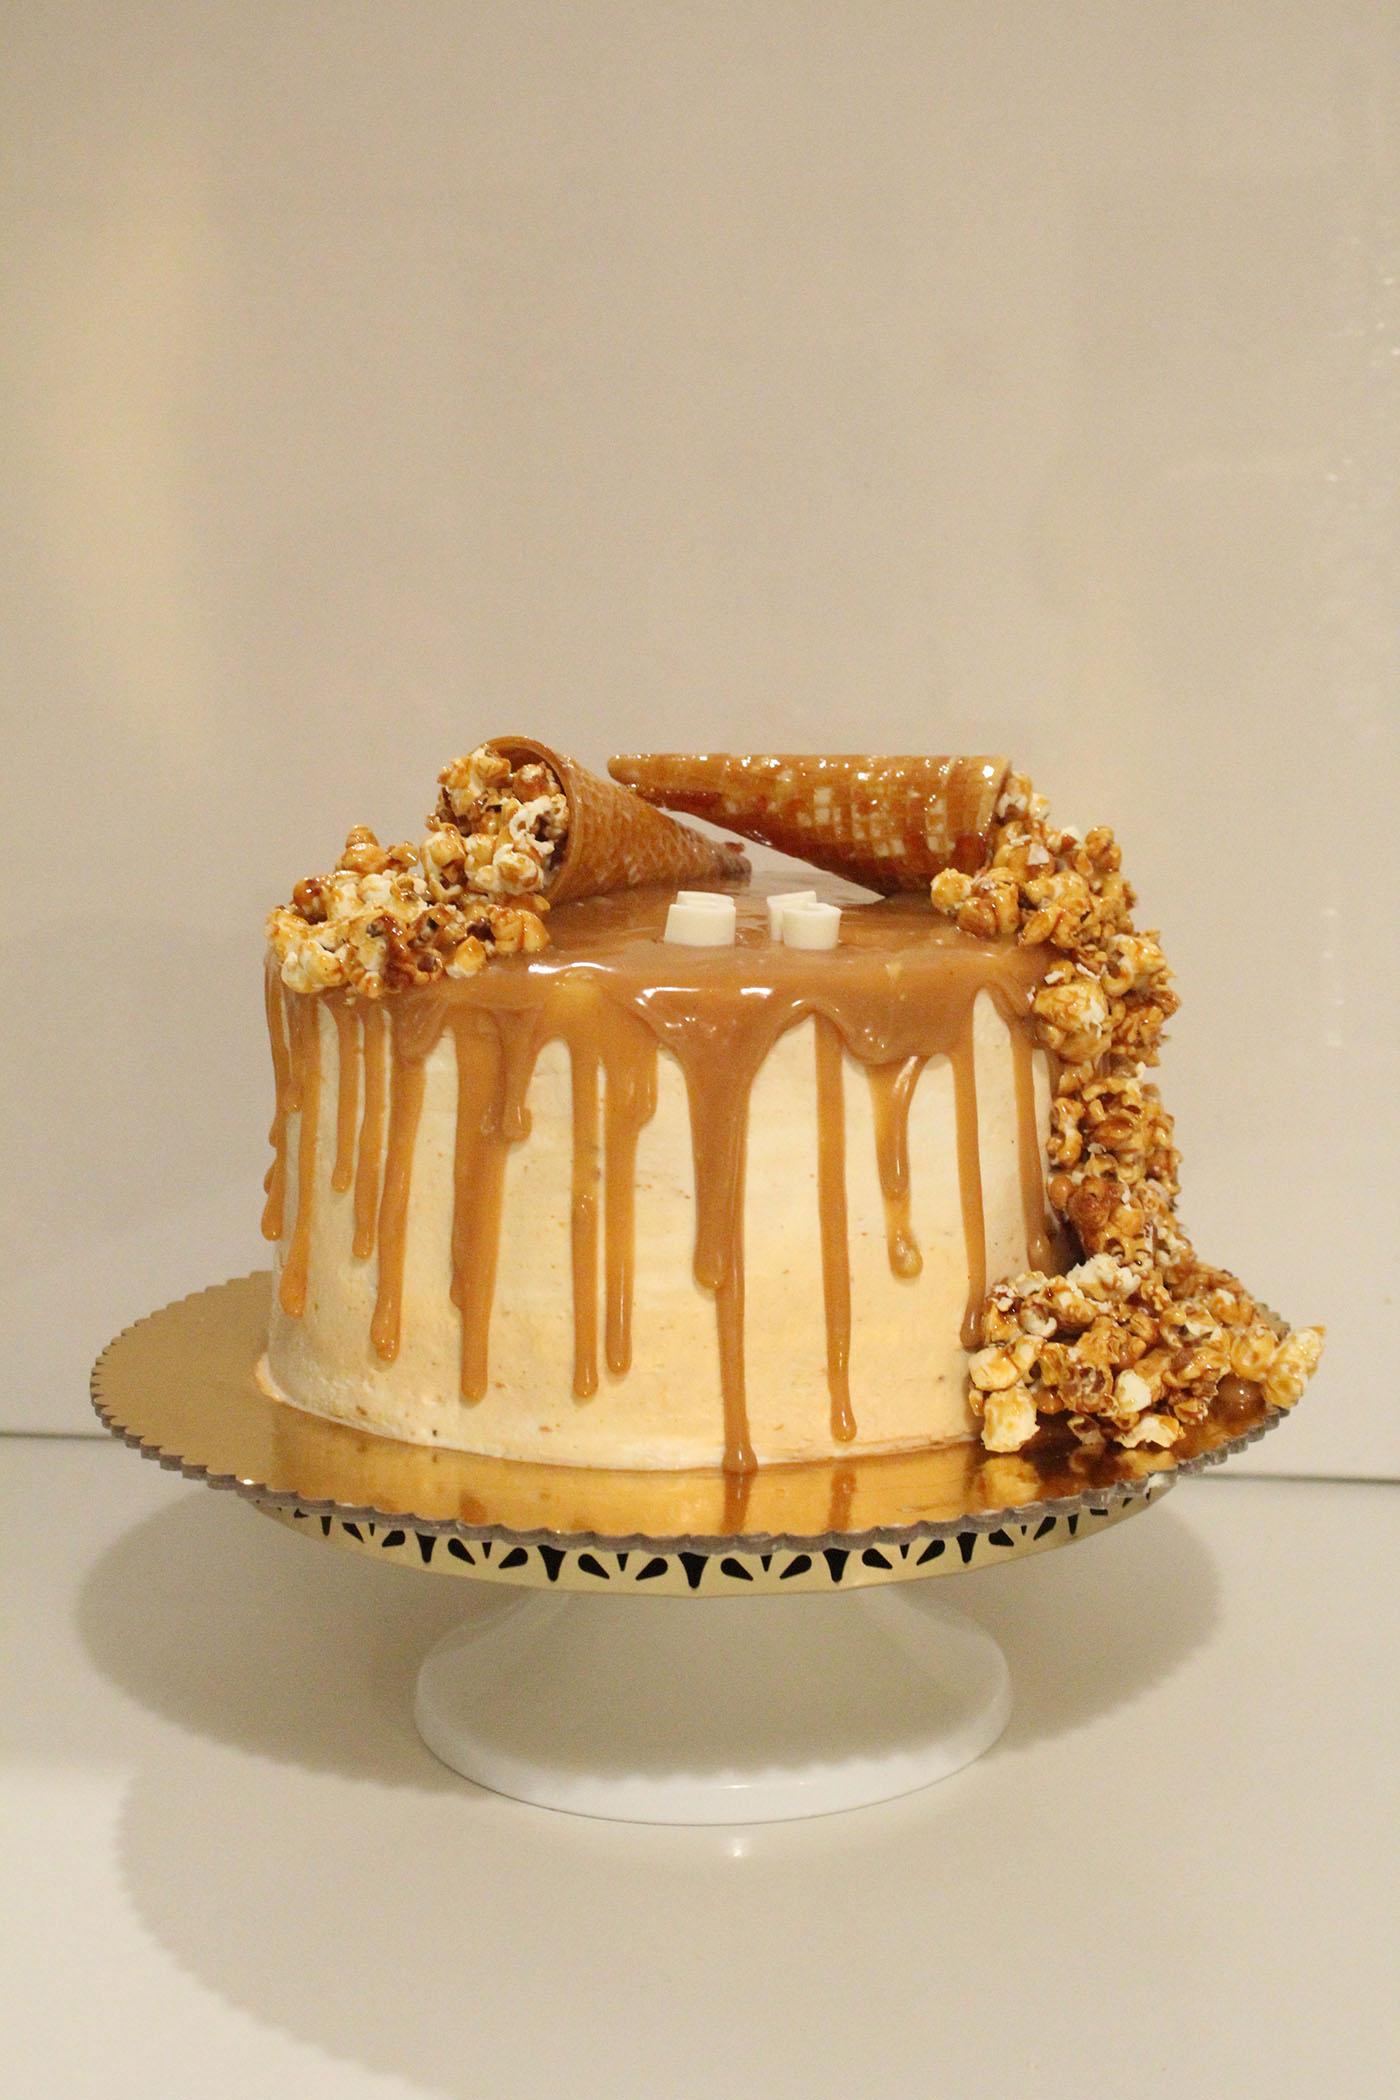 IMG 9468 - עוגת זילוף